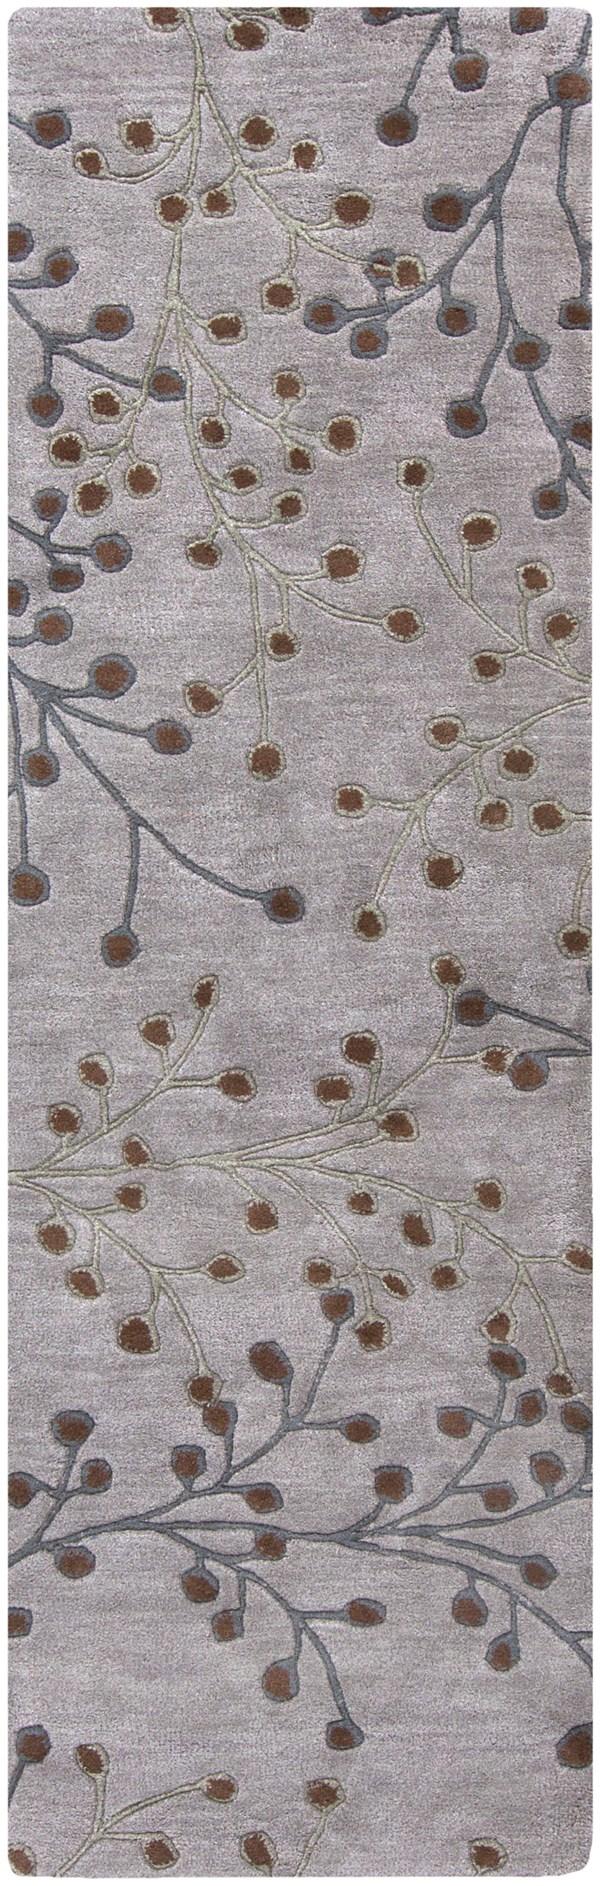 Medium Gray, Gray, Dark Brown Floral / Botanical Area Rug